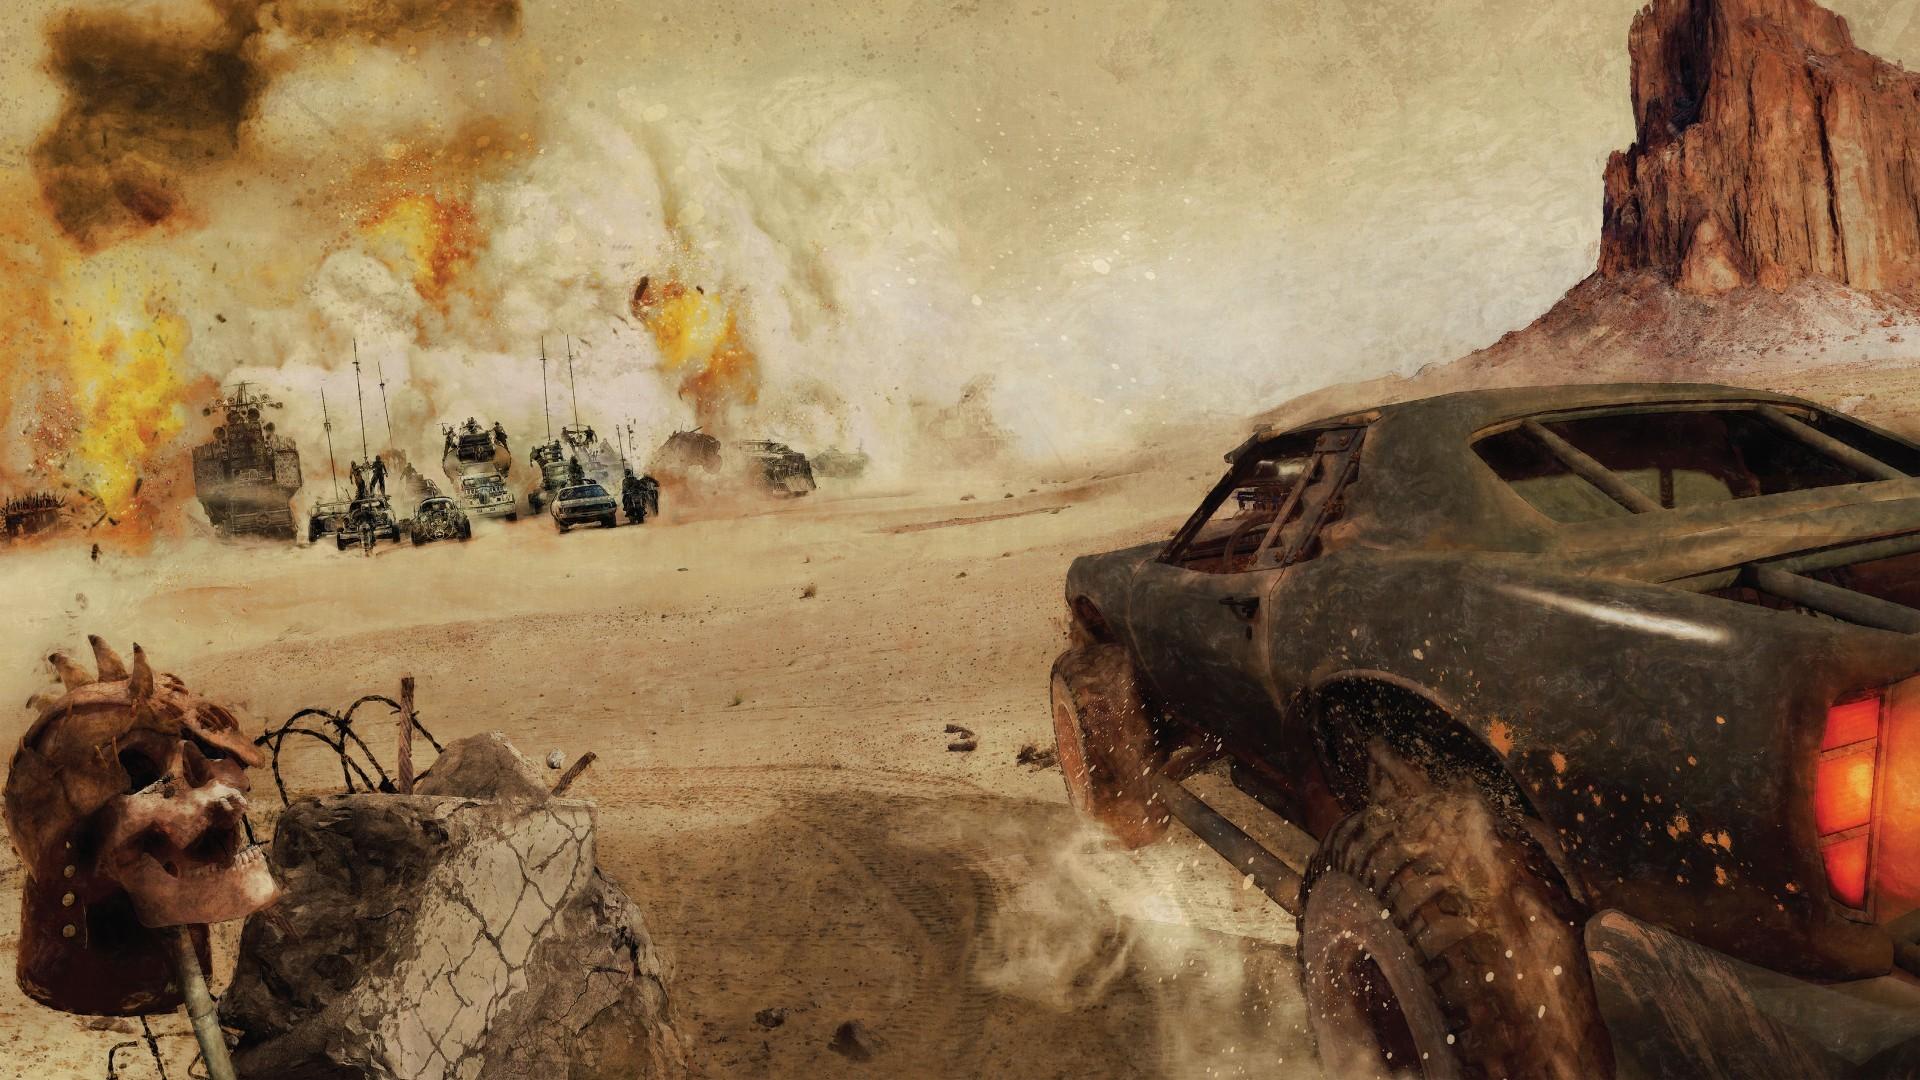 Monstercat Mad Cat (Mad Max) Wallpaper by JovicaSmileski